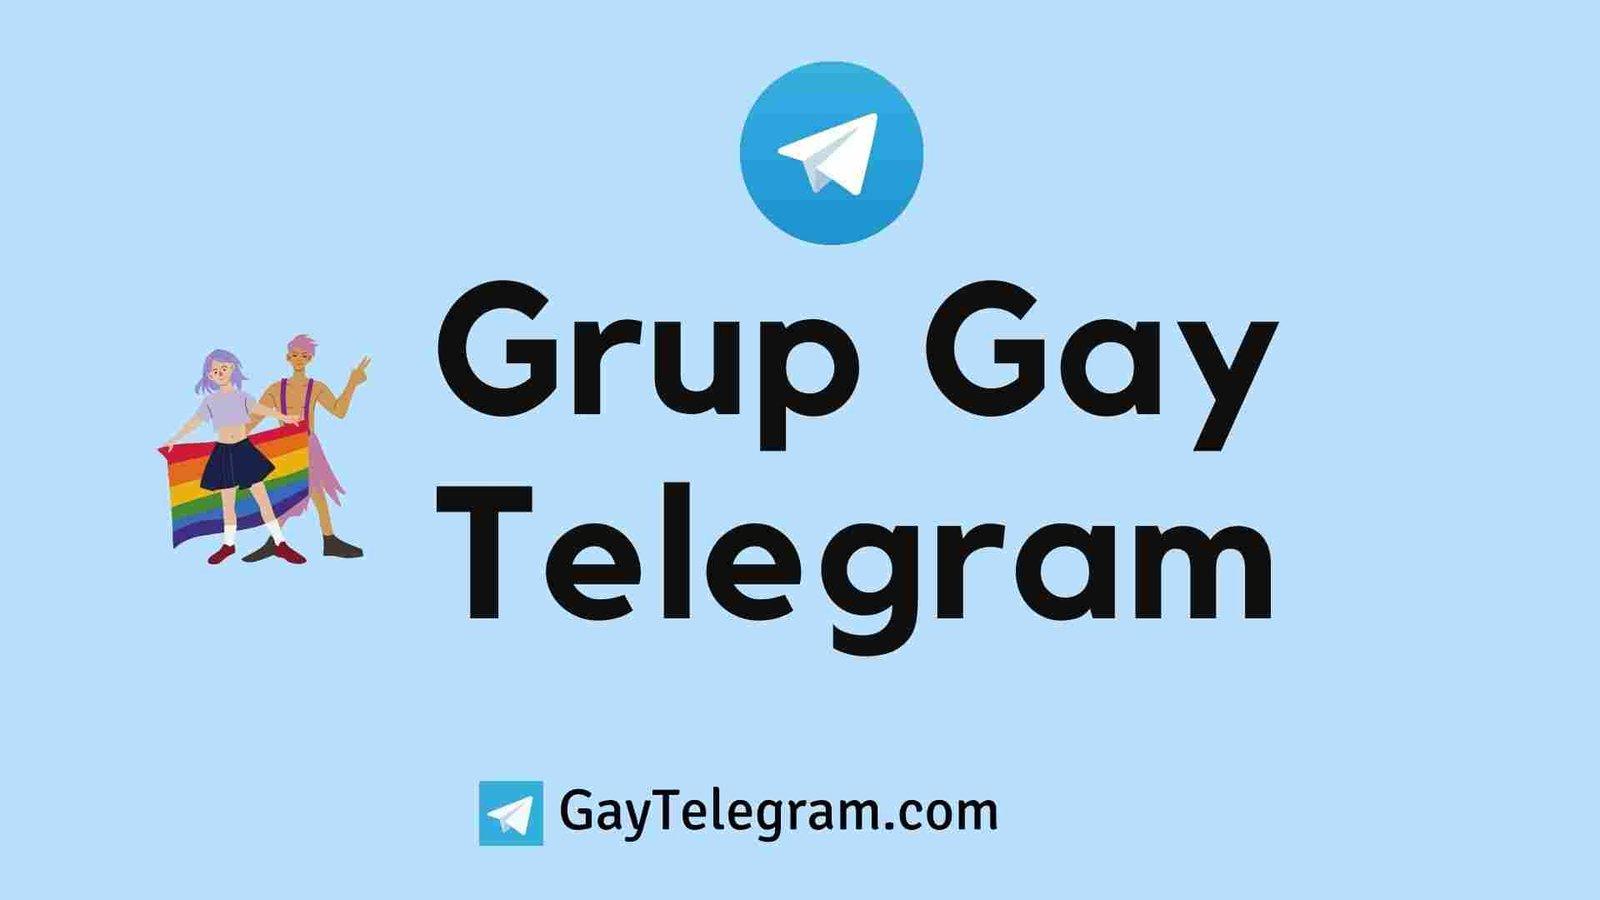 Grup gay telegram